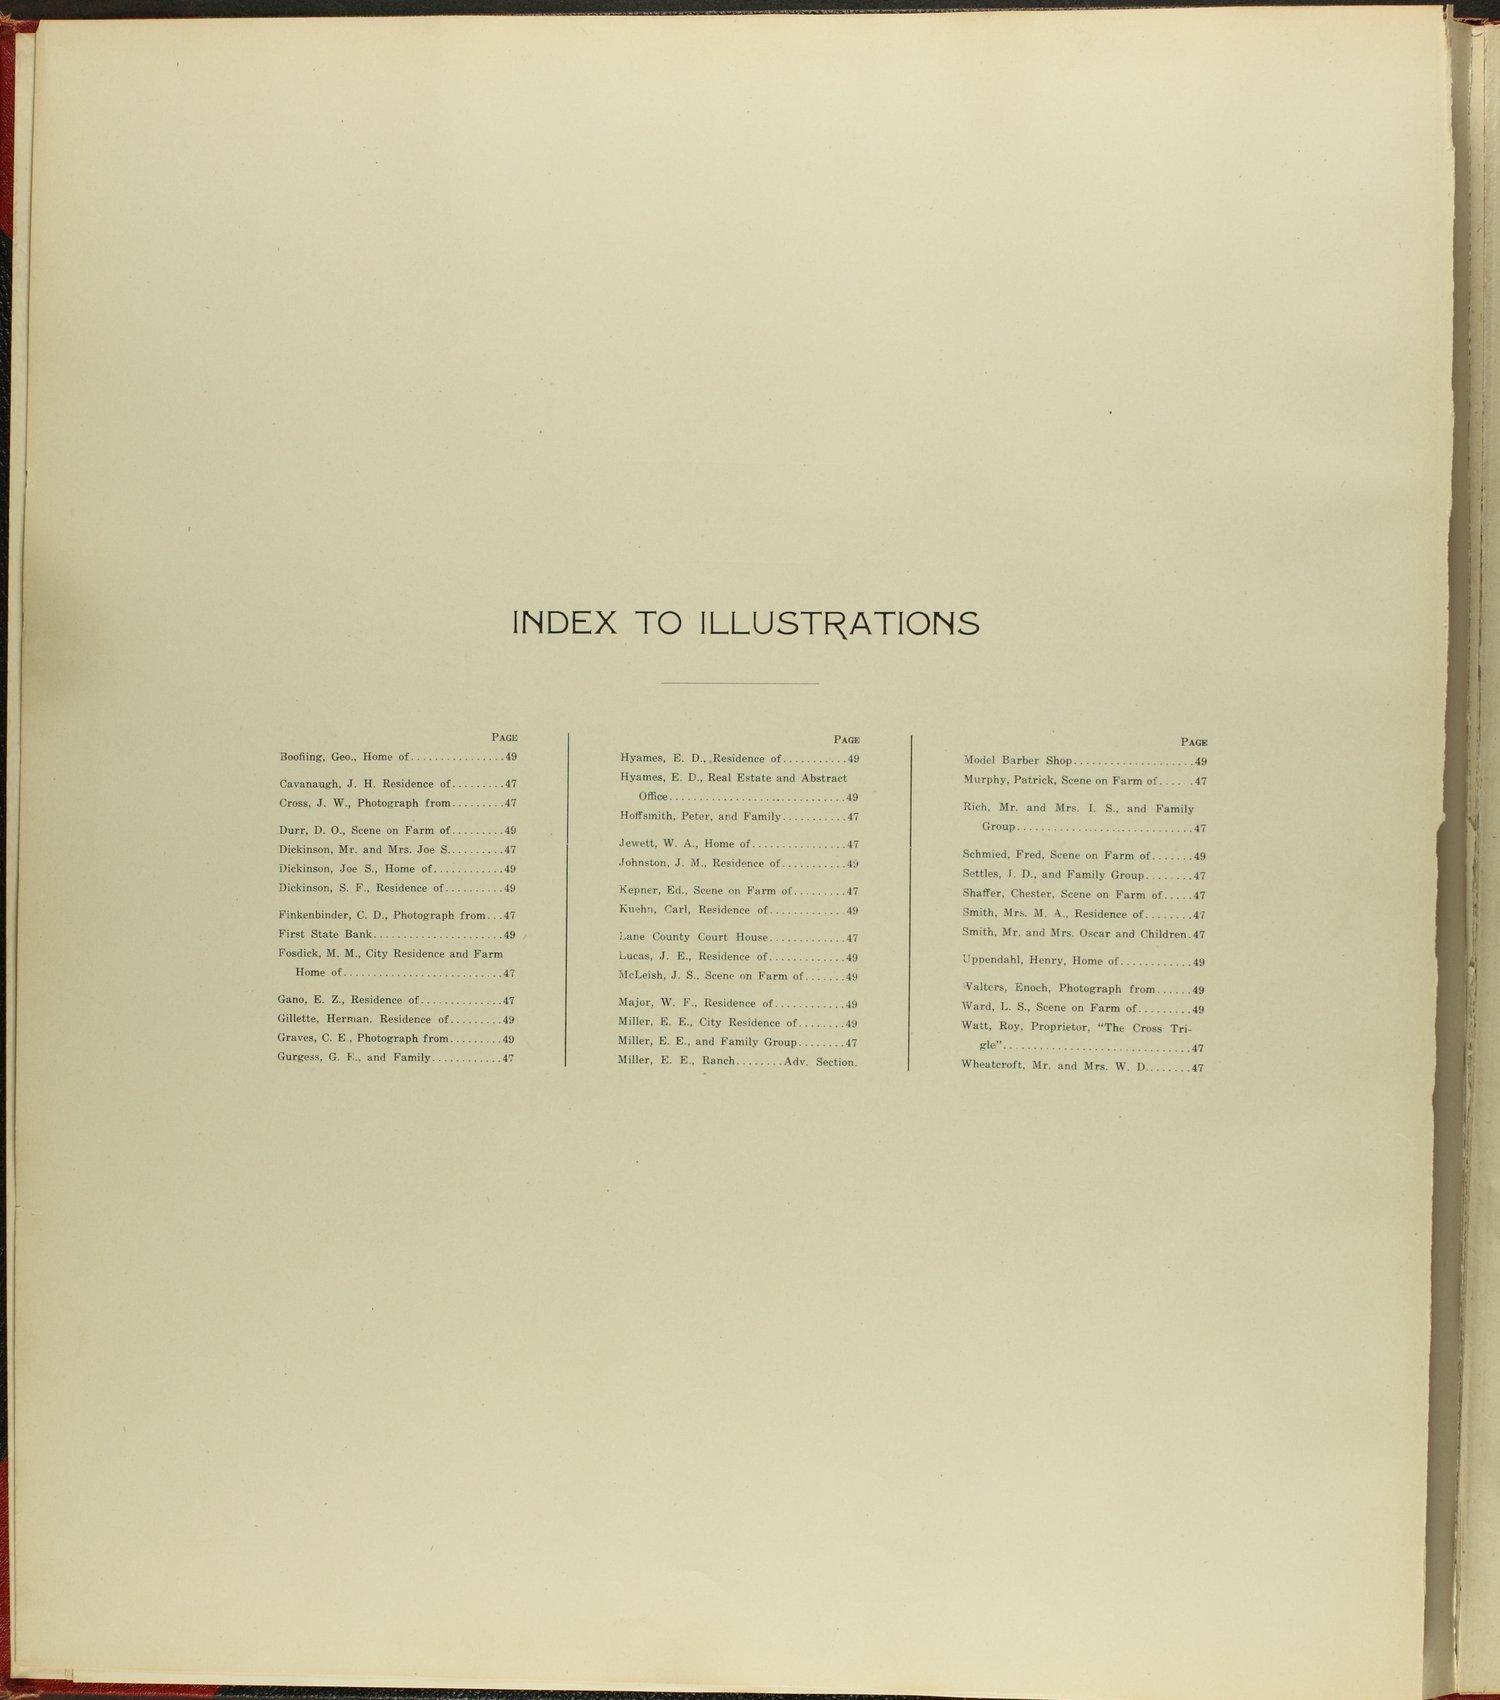 Standard atlas of Lane county, Kansas - Index to Illustrations